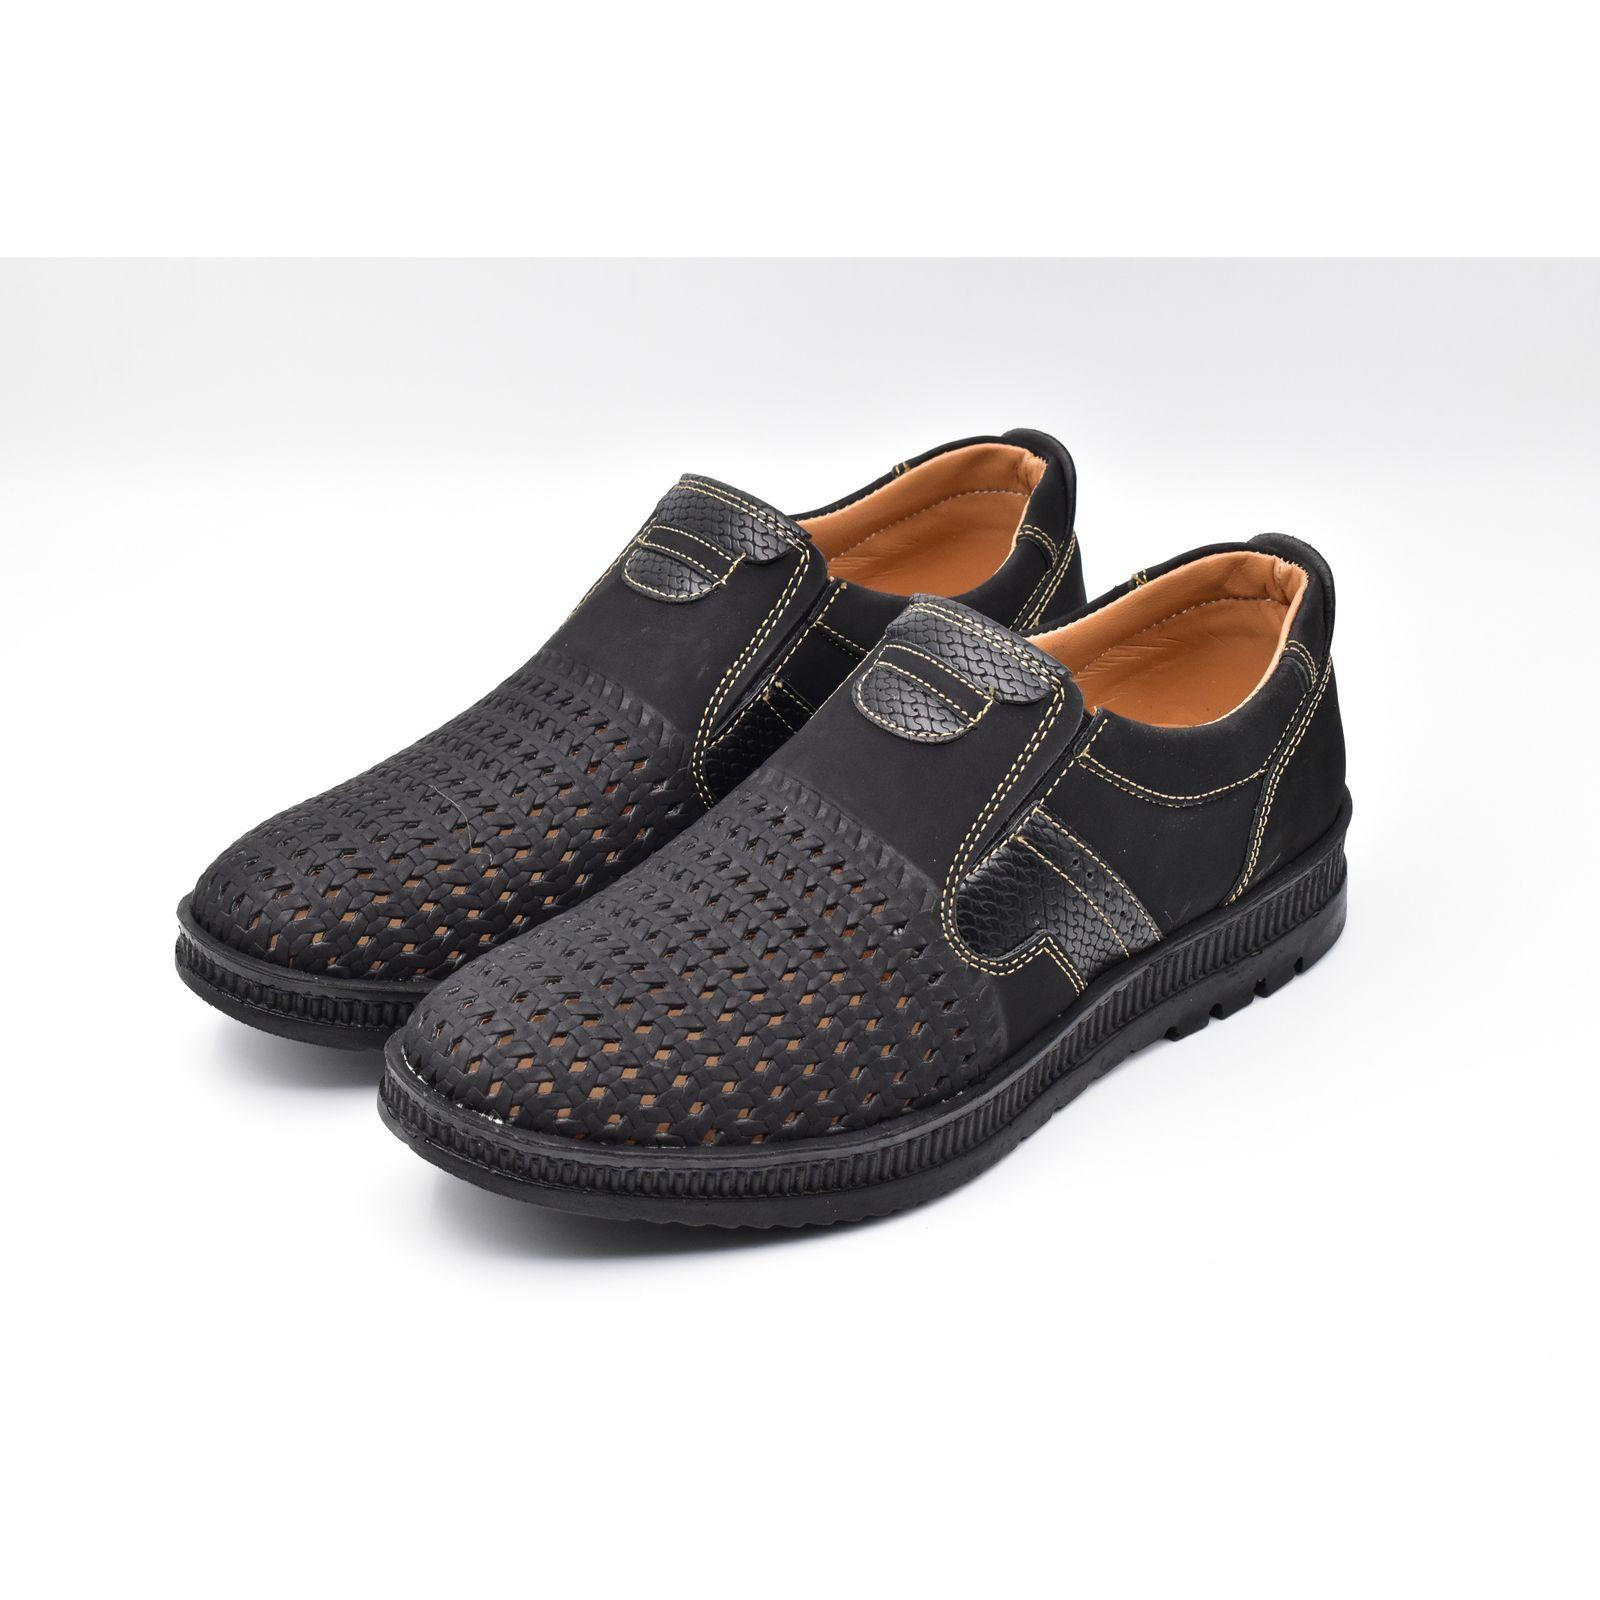 کفش روزمره مردانه مدل گلف کد 7014 -  - 2